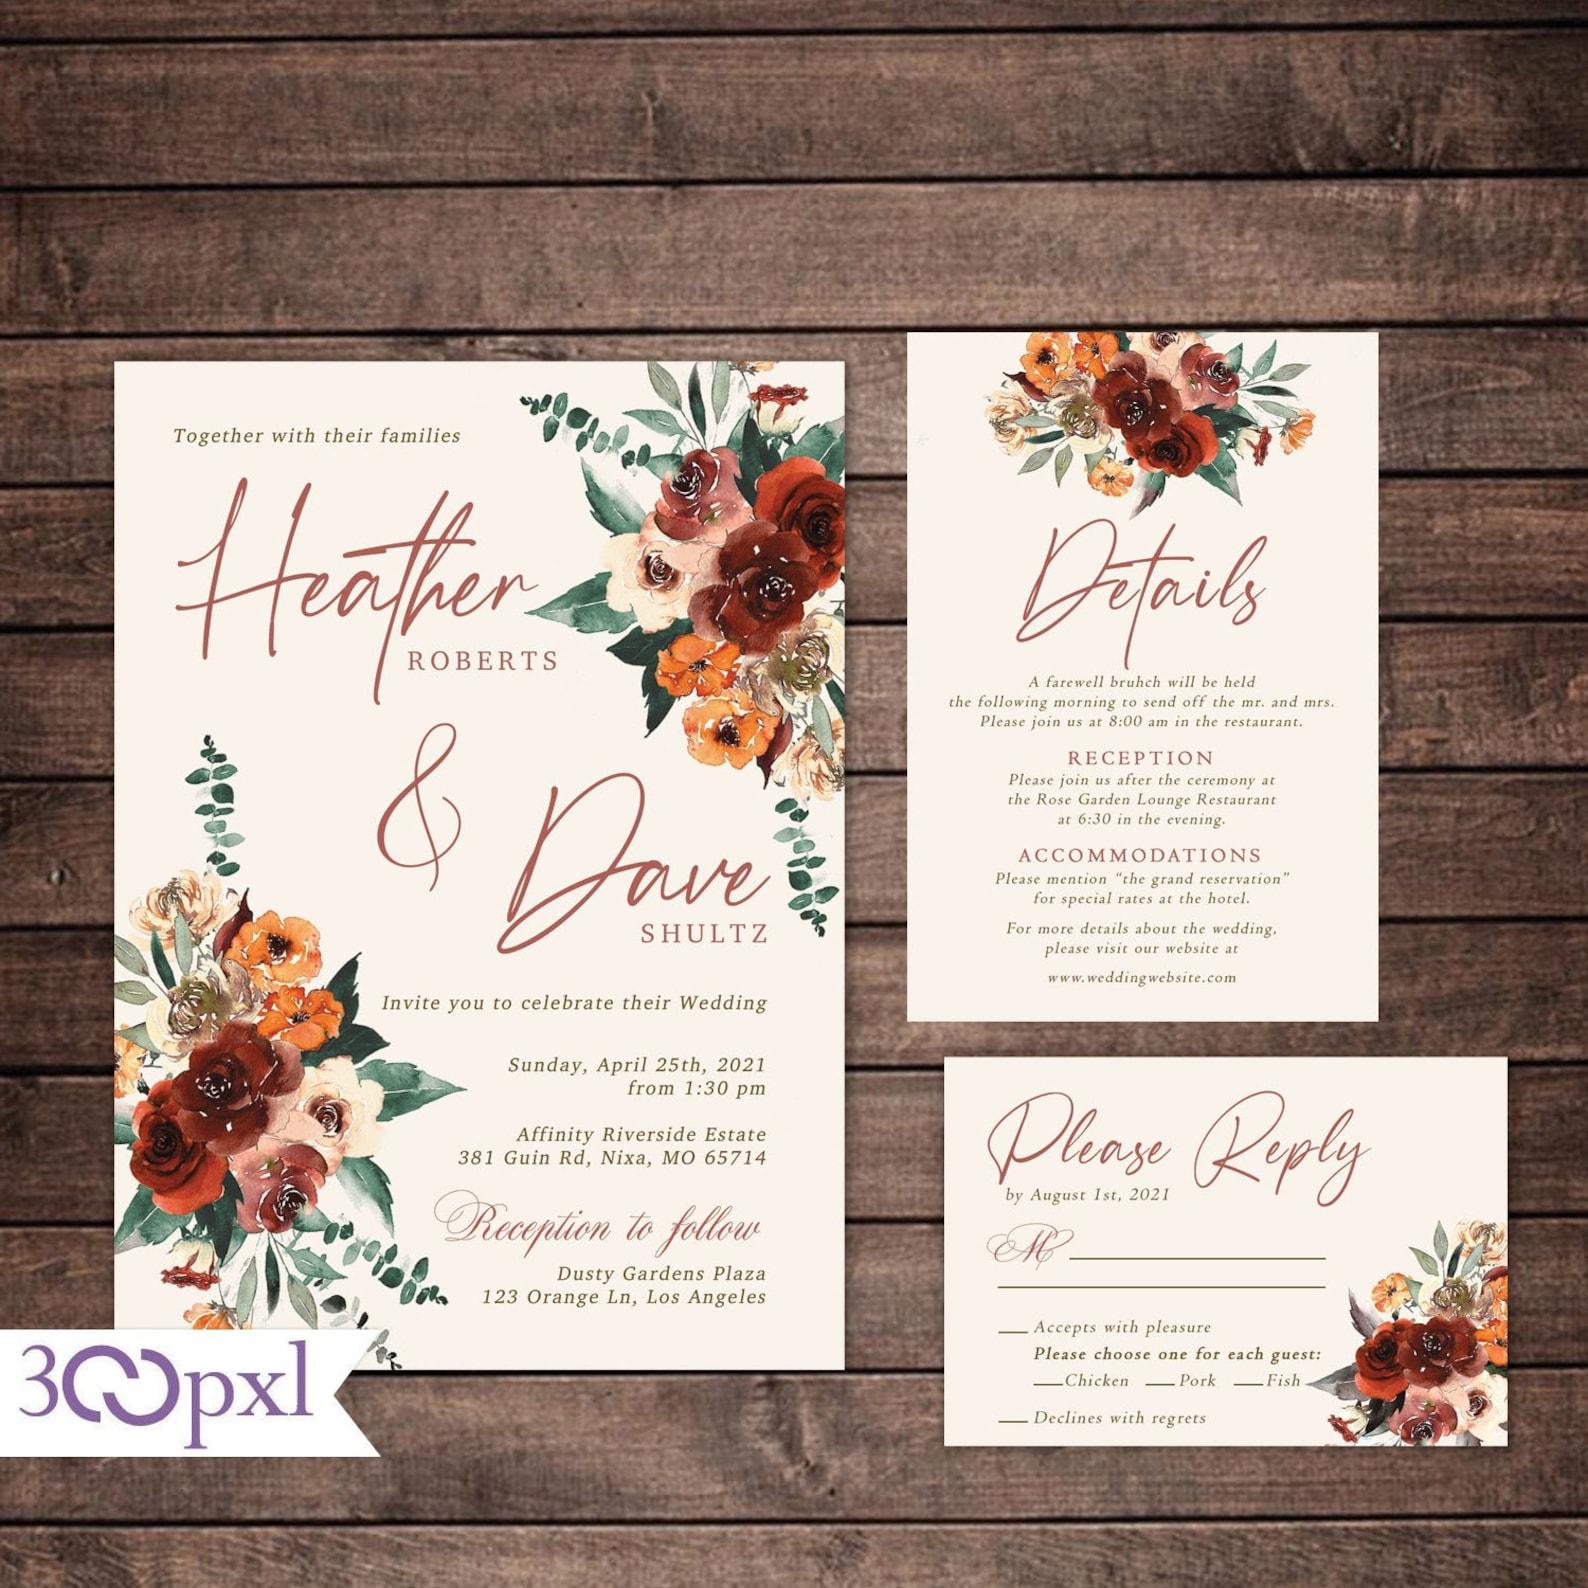 Autumn/Fall themed wedding invitations